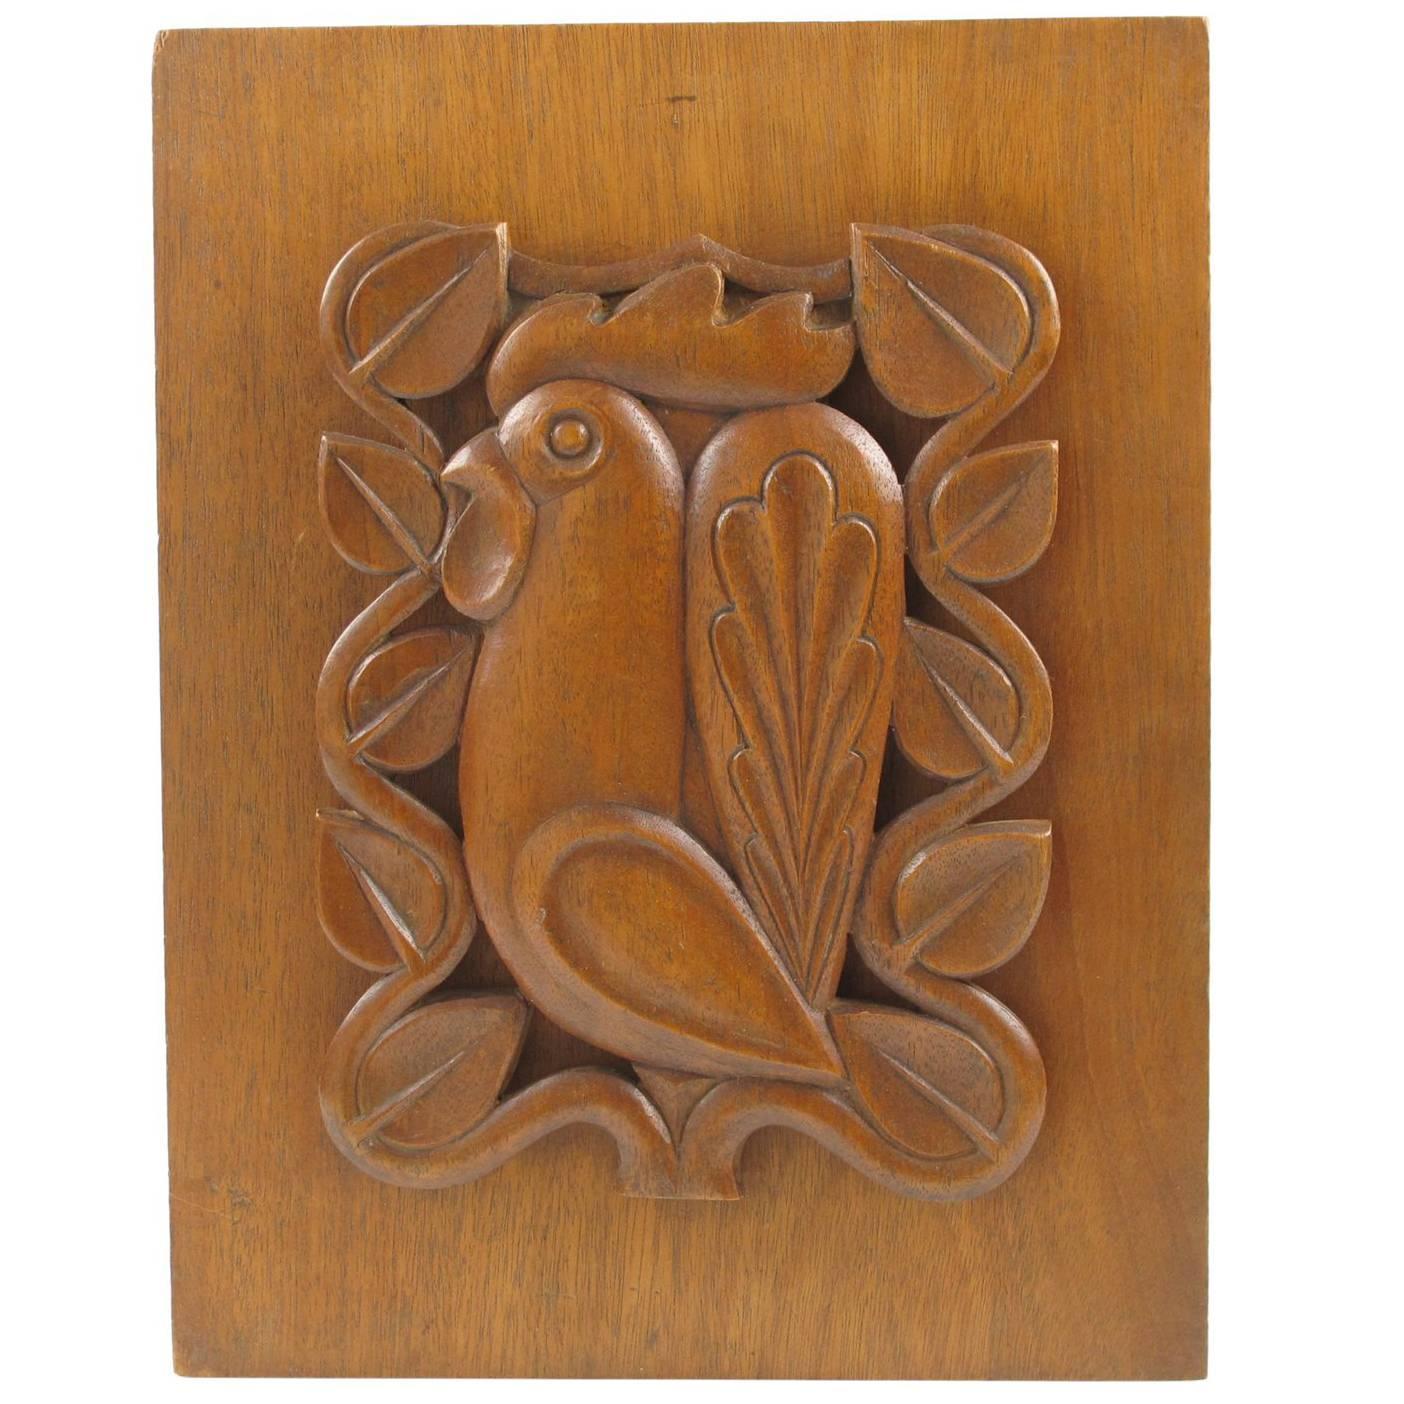 1950s Mid Century Modern Wooden Wall Art Sculpture Panel Rooster Design